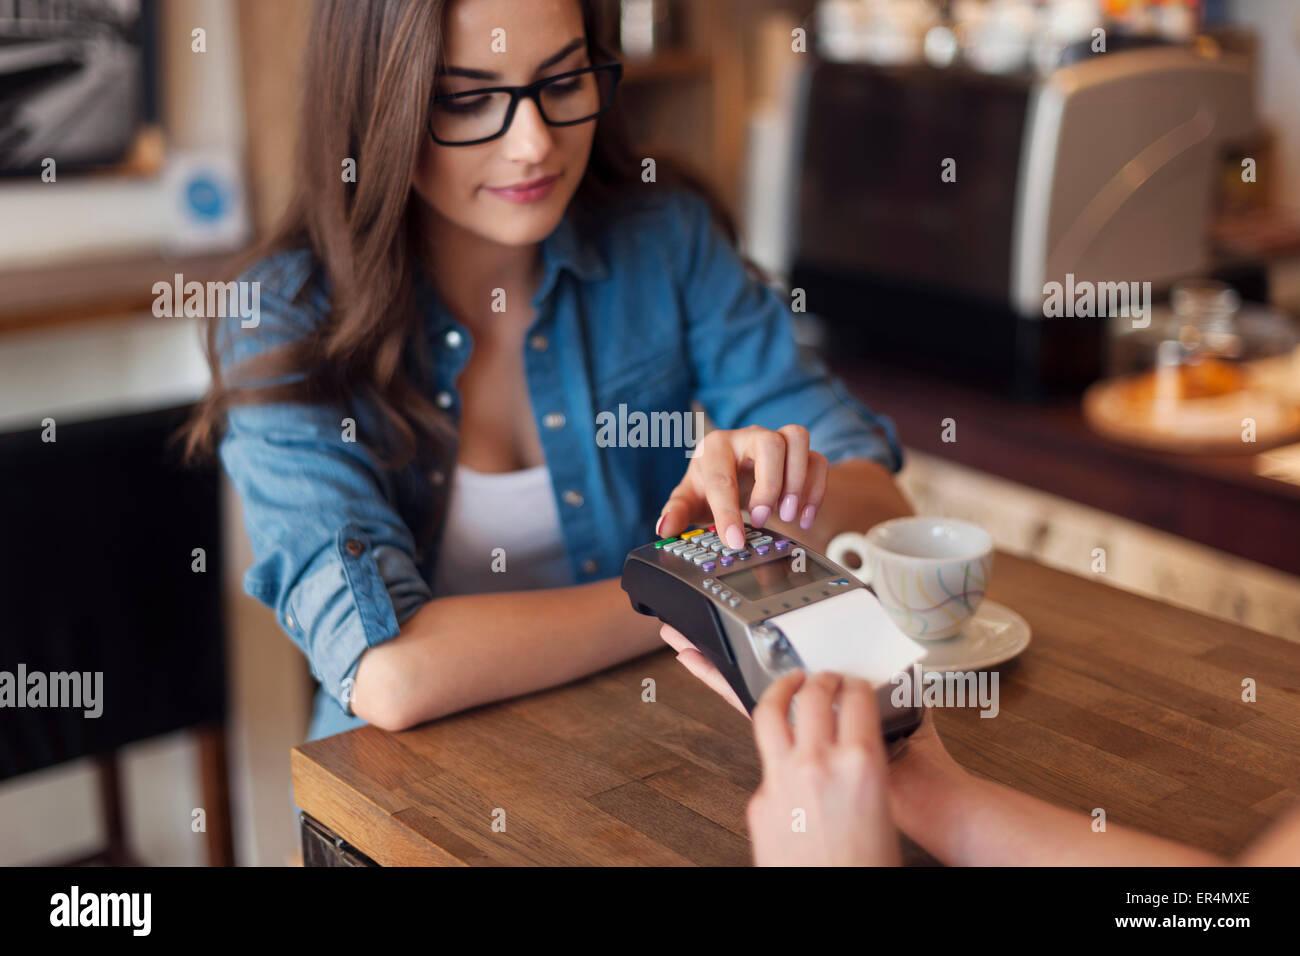 Junge Frau für Café Kreditkartenleser bezahlen. Krakau, Polen Stockbild